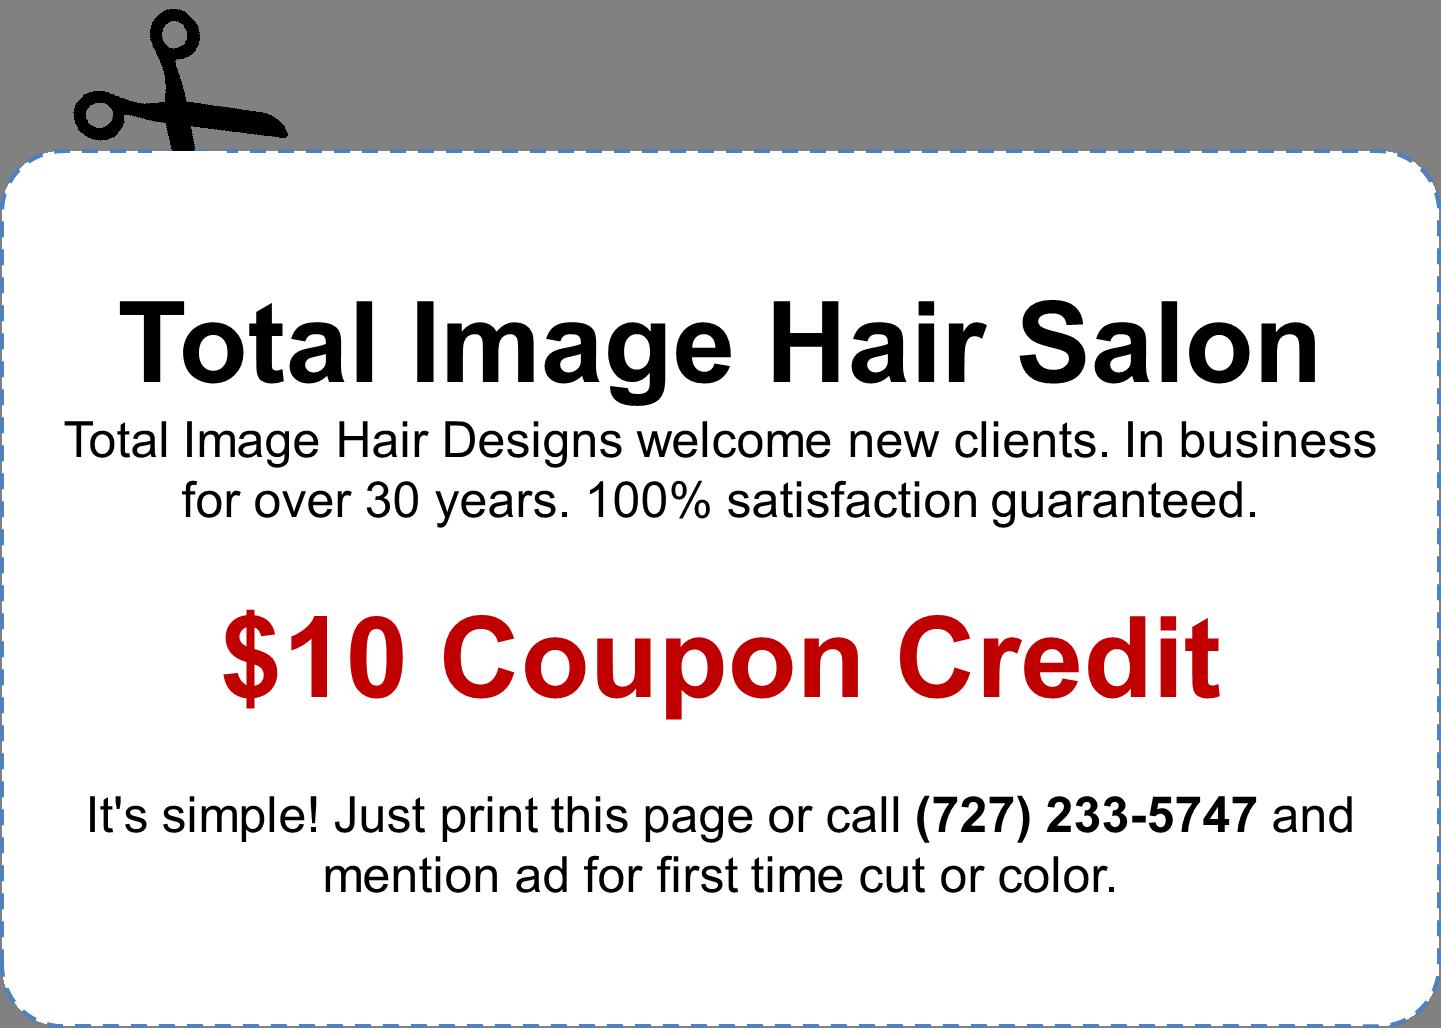 $10 Coupon Credit